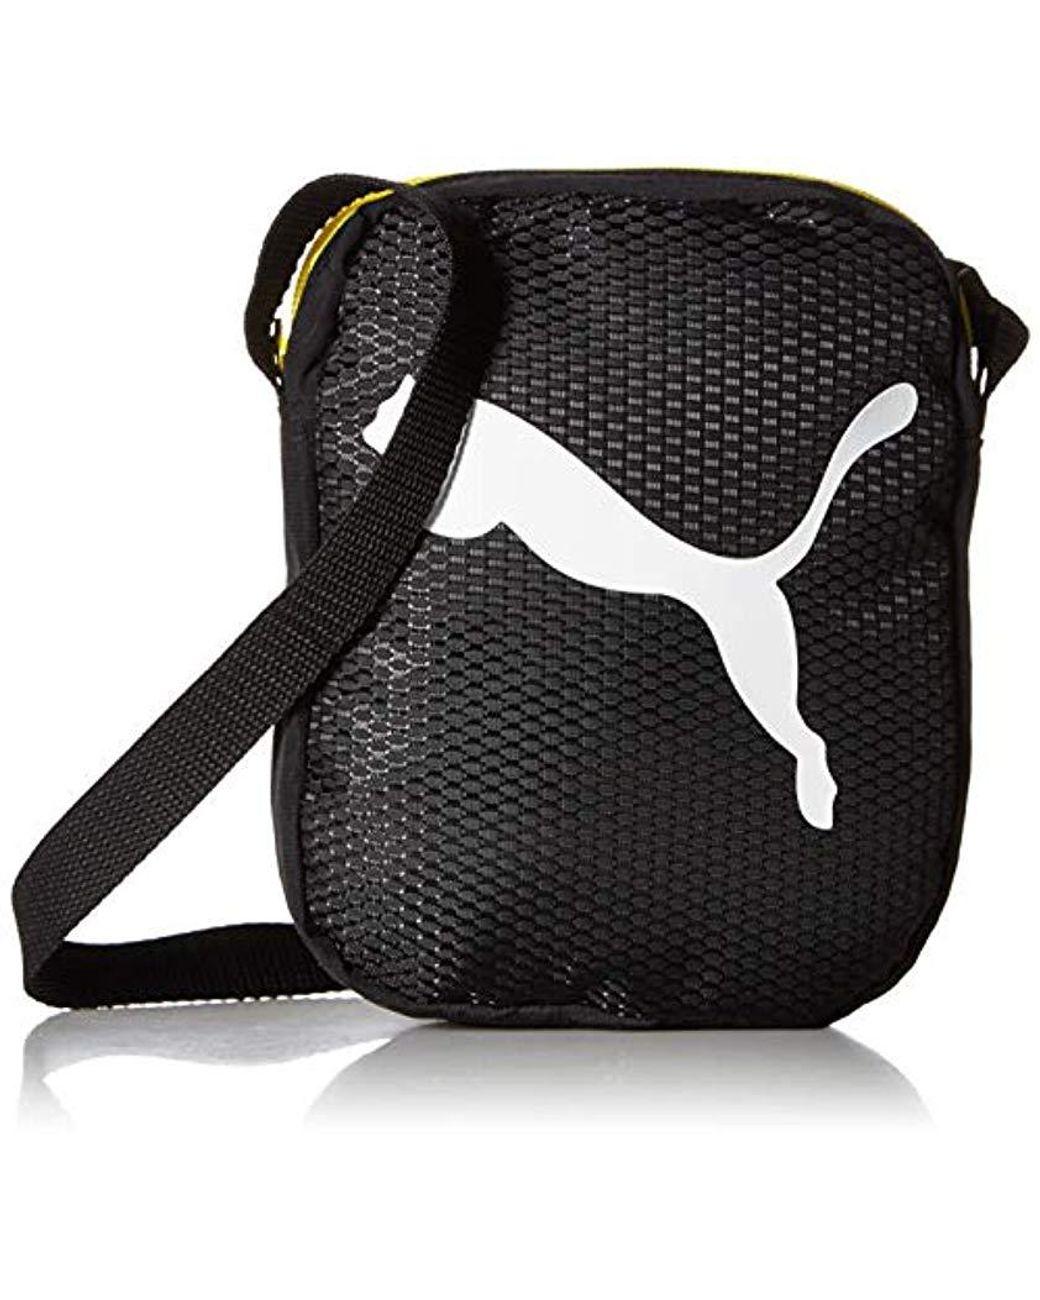 46237bd5b479b Women's Black Uniform Cross Body Shoulder Bag